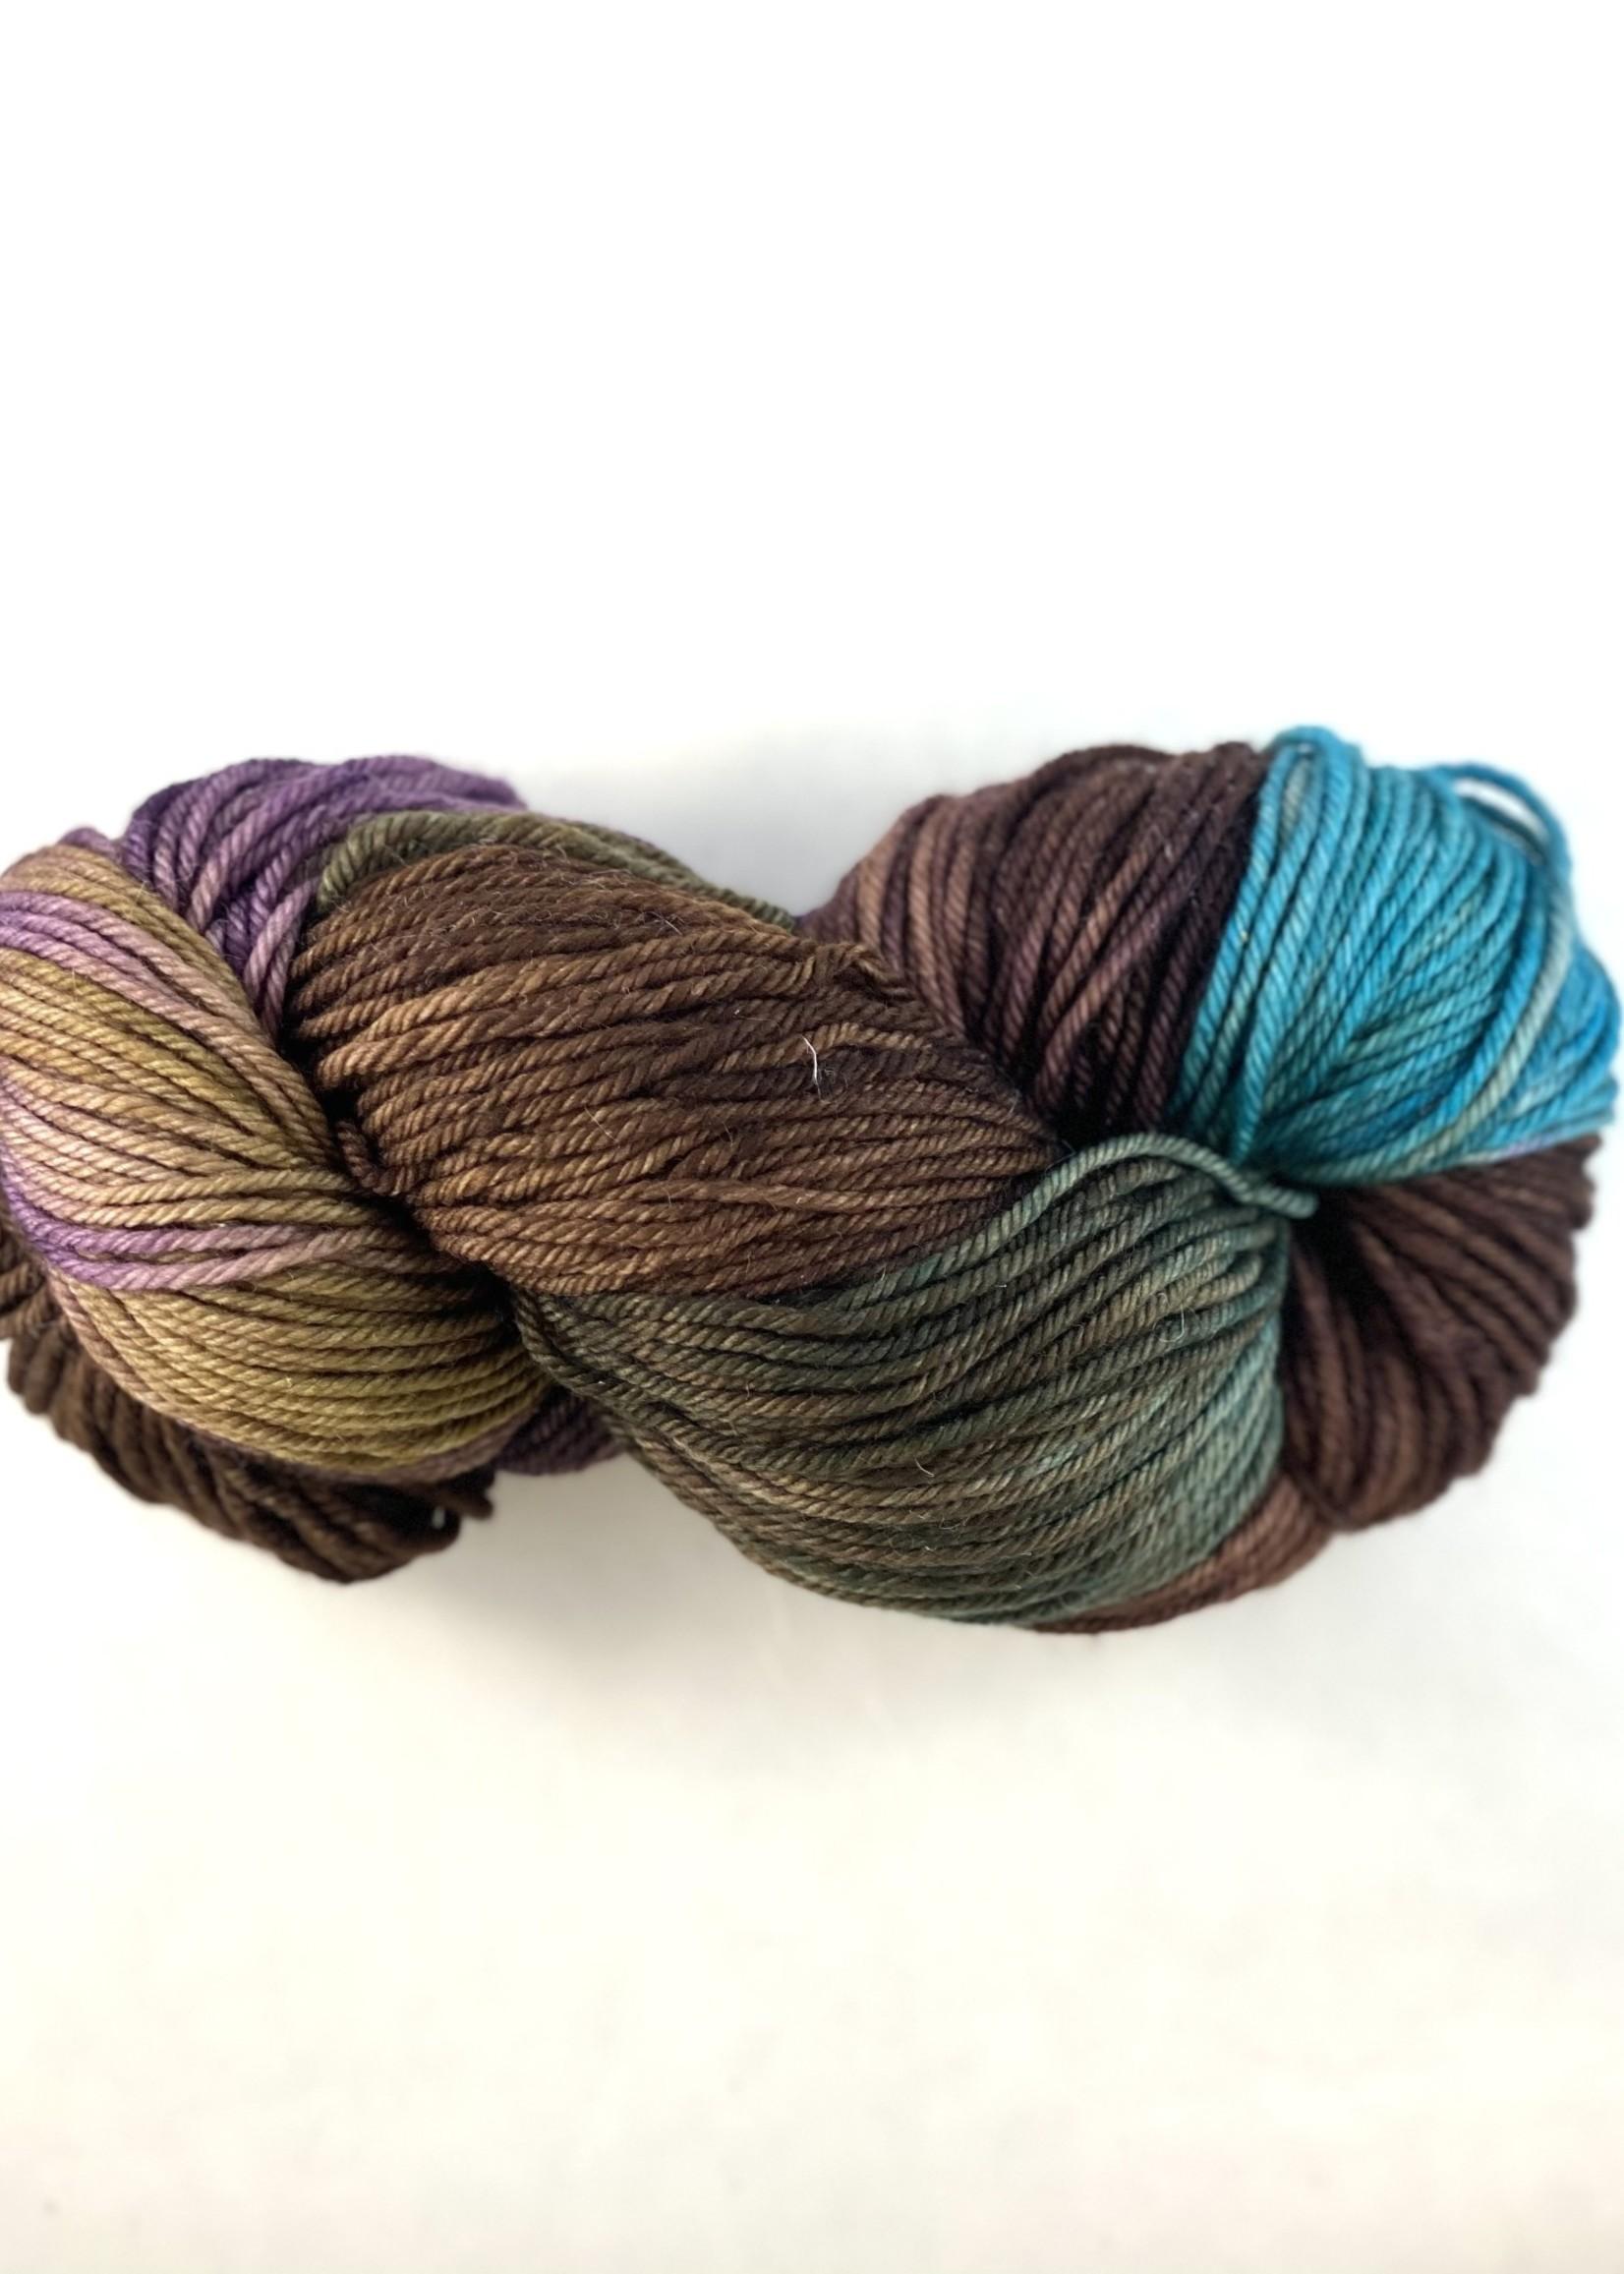 Fleece Artist Yarn Fleece Artist Chinook Yarn - Walnut